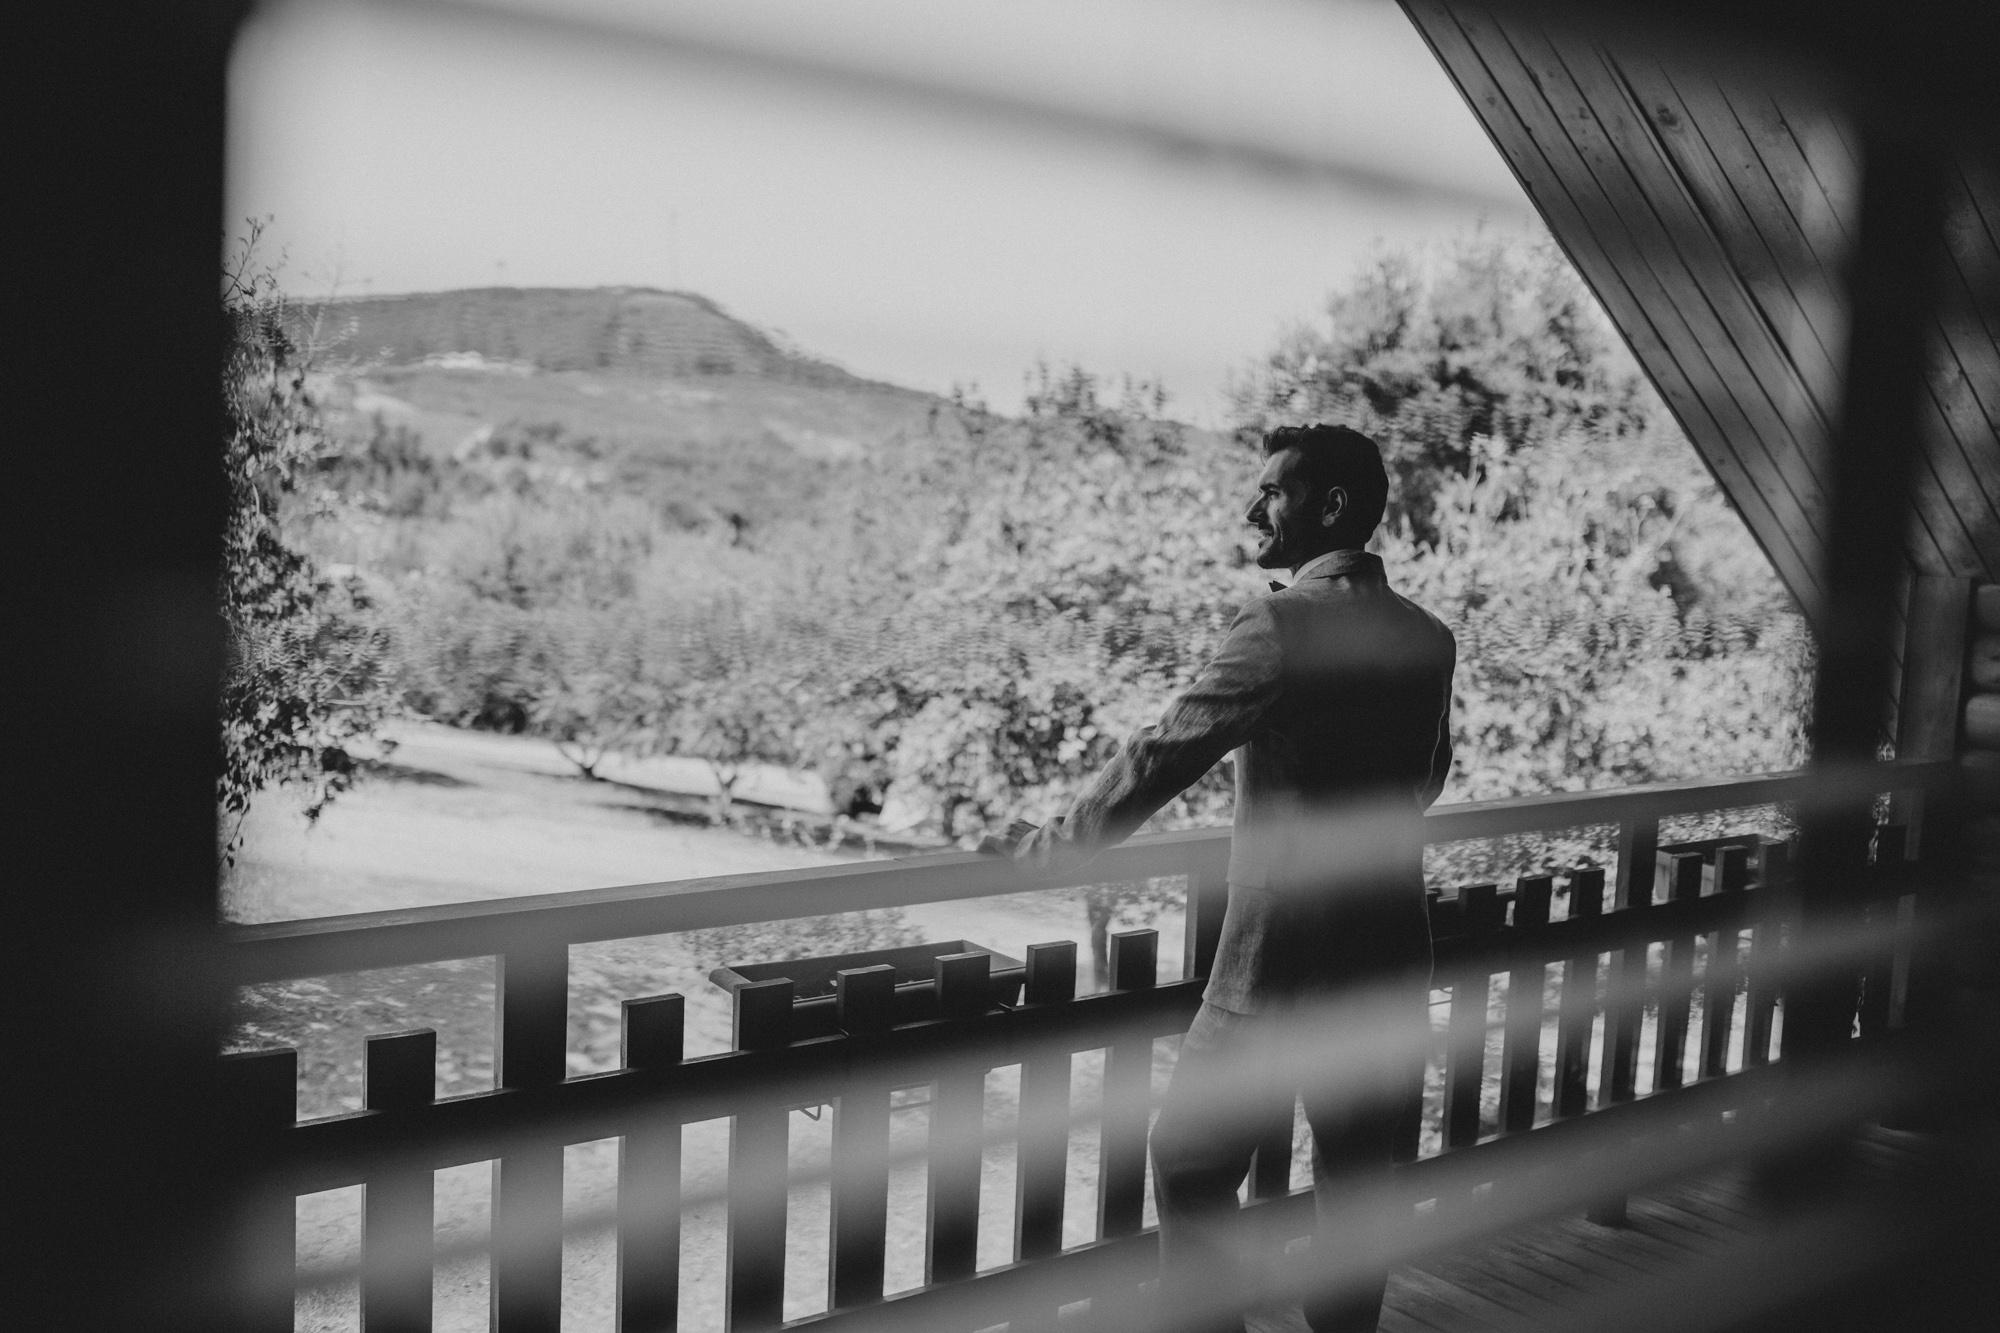 091-carina-e-samuel-wedding-casamento-quinta-dos-rouxinois-rustico-my-fancy-wedding-mafra-malveira-lisboa-sintra-cascais-filipe-santiago-fotografia-fotografo-lifestyle-destination-portugal